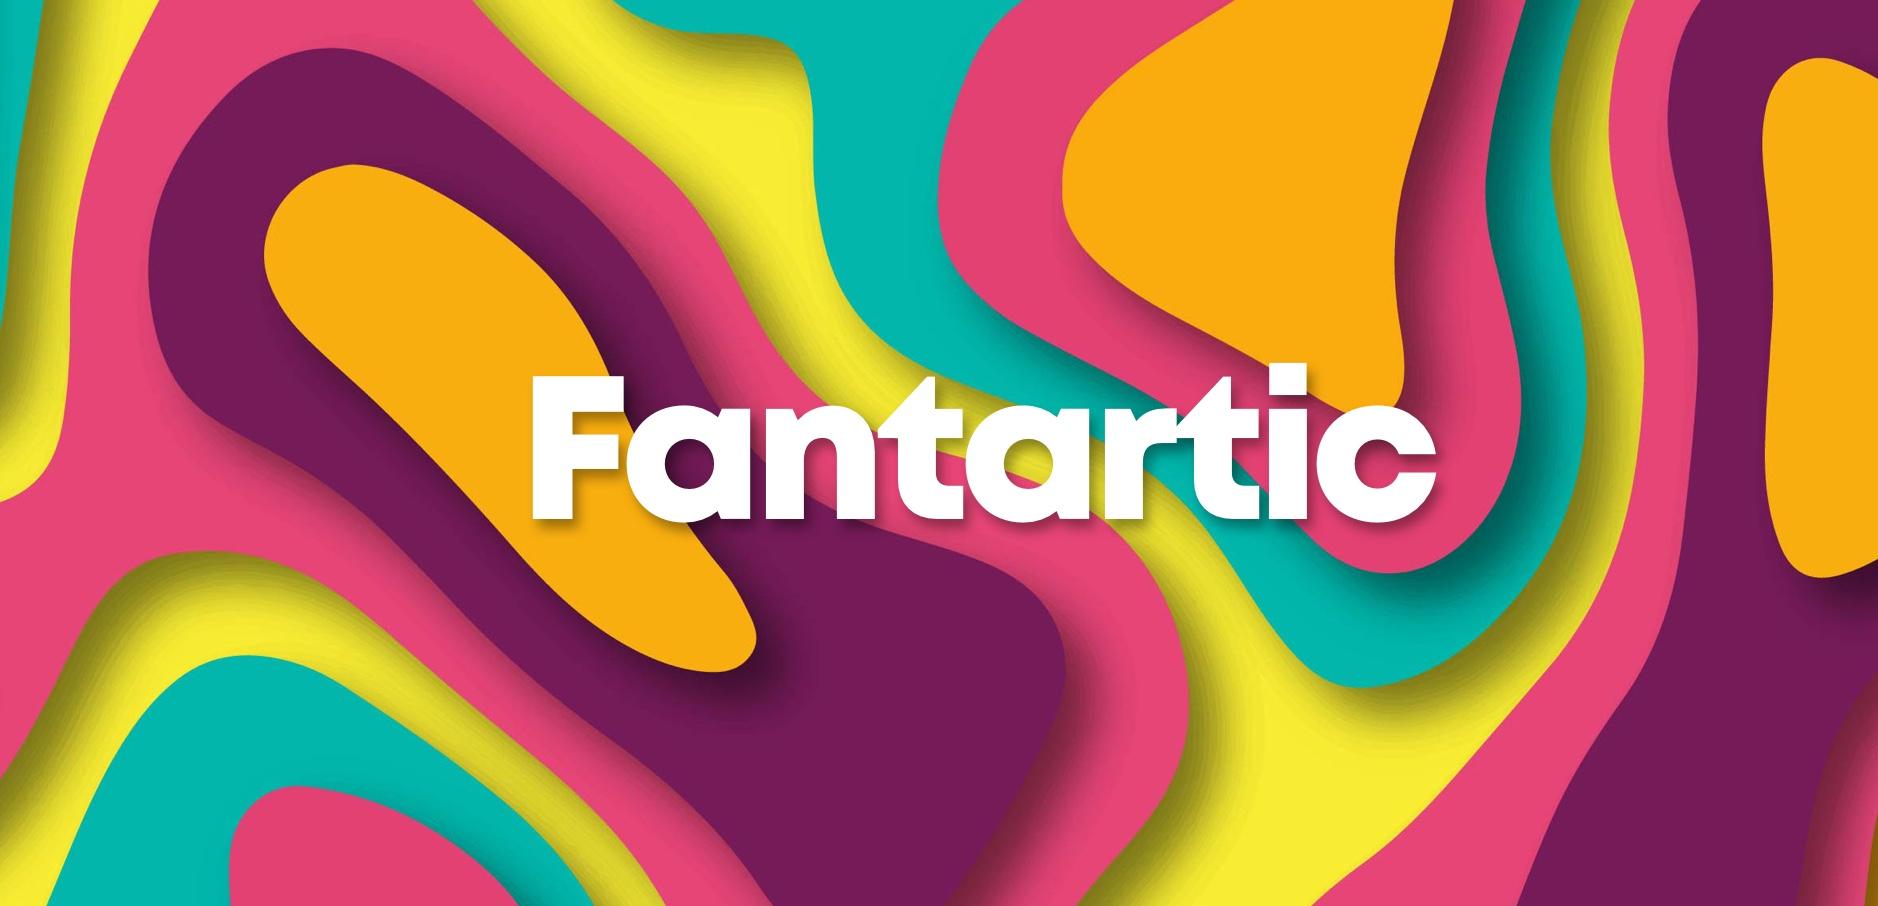 Fantartic